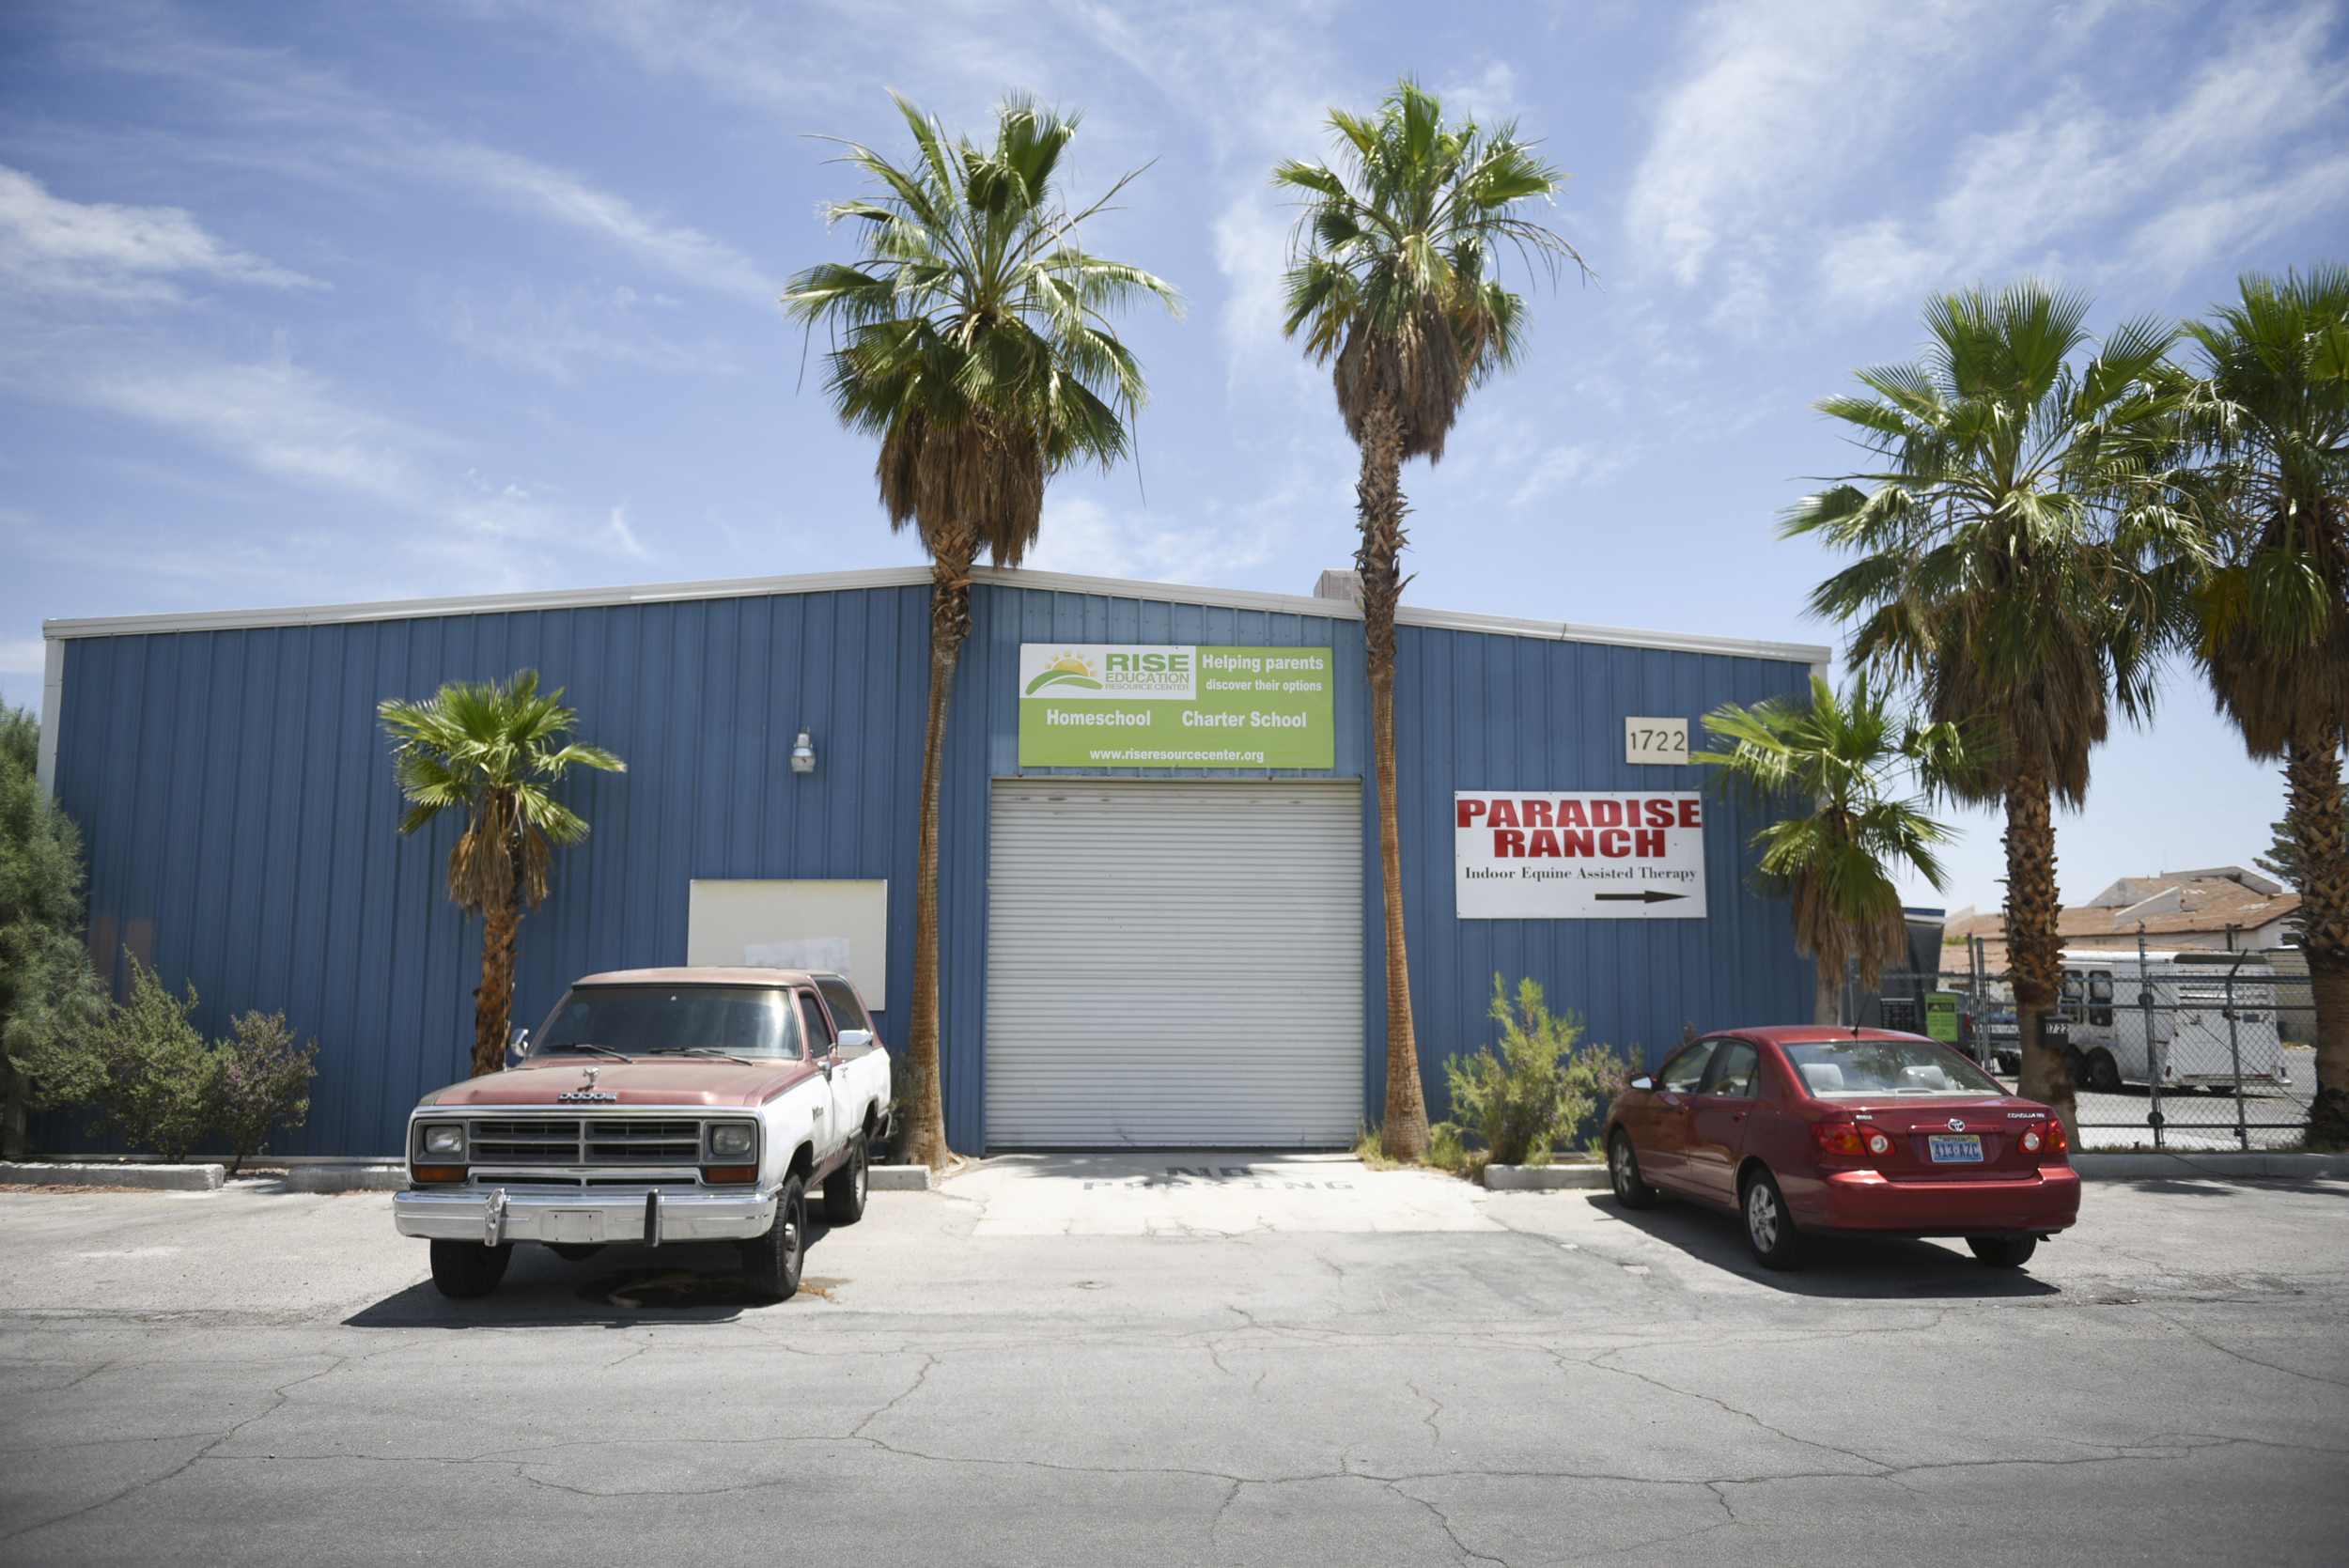 Paradise Ranch at 1722 Primrose Path in Las Vegas is shown Wednesday, June 3, 2015. (Jason Ogulnik/Las Vegas Review-Journal)